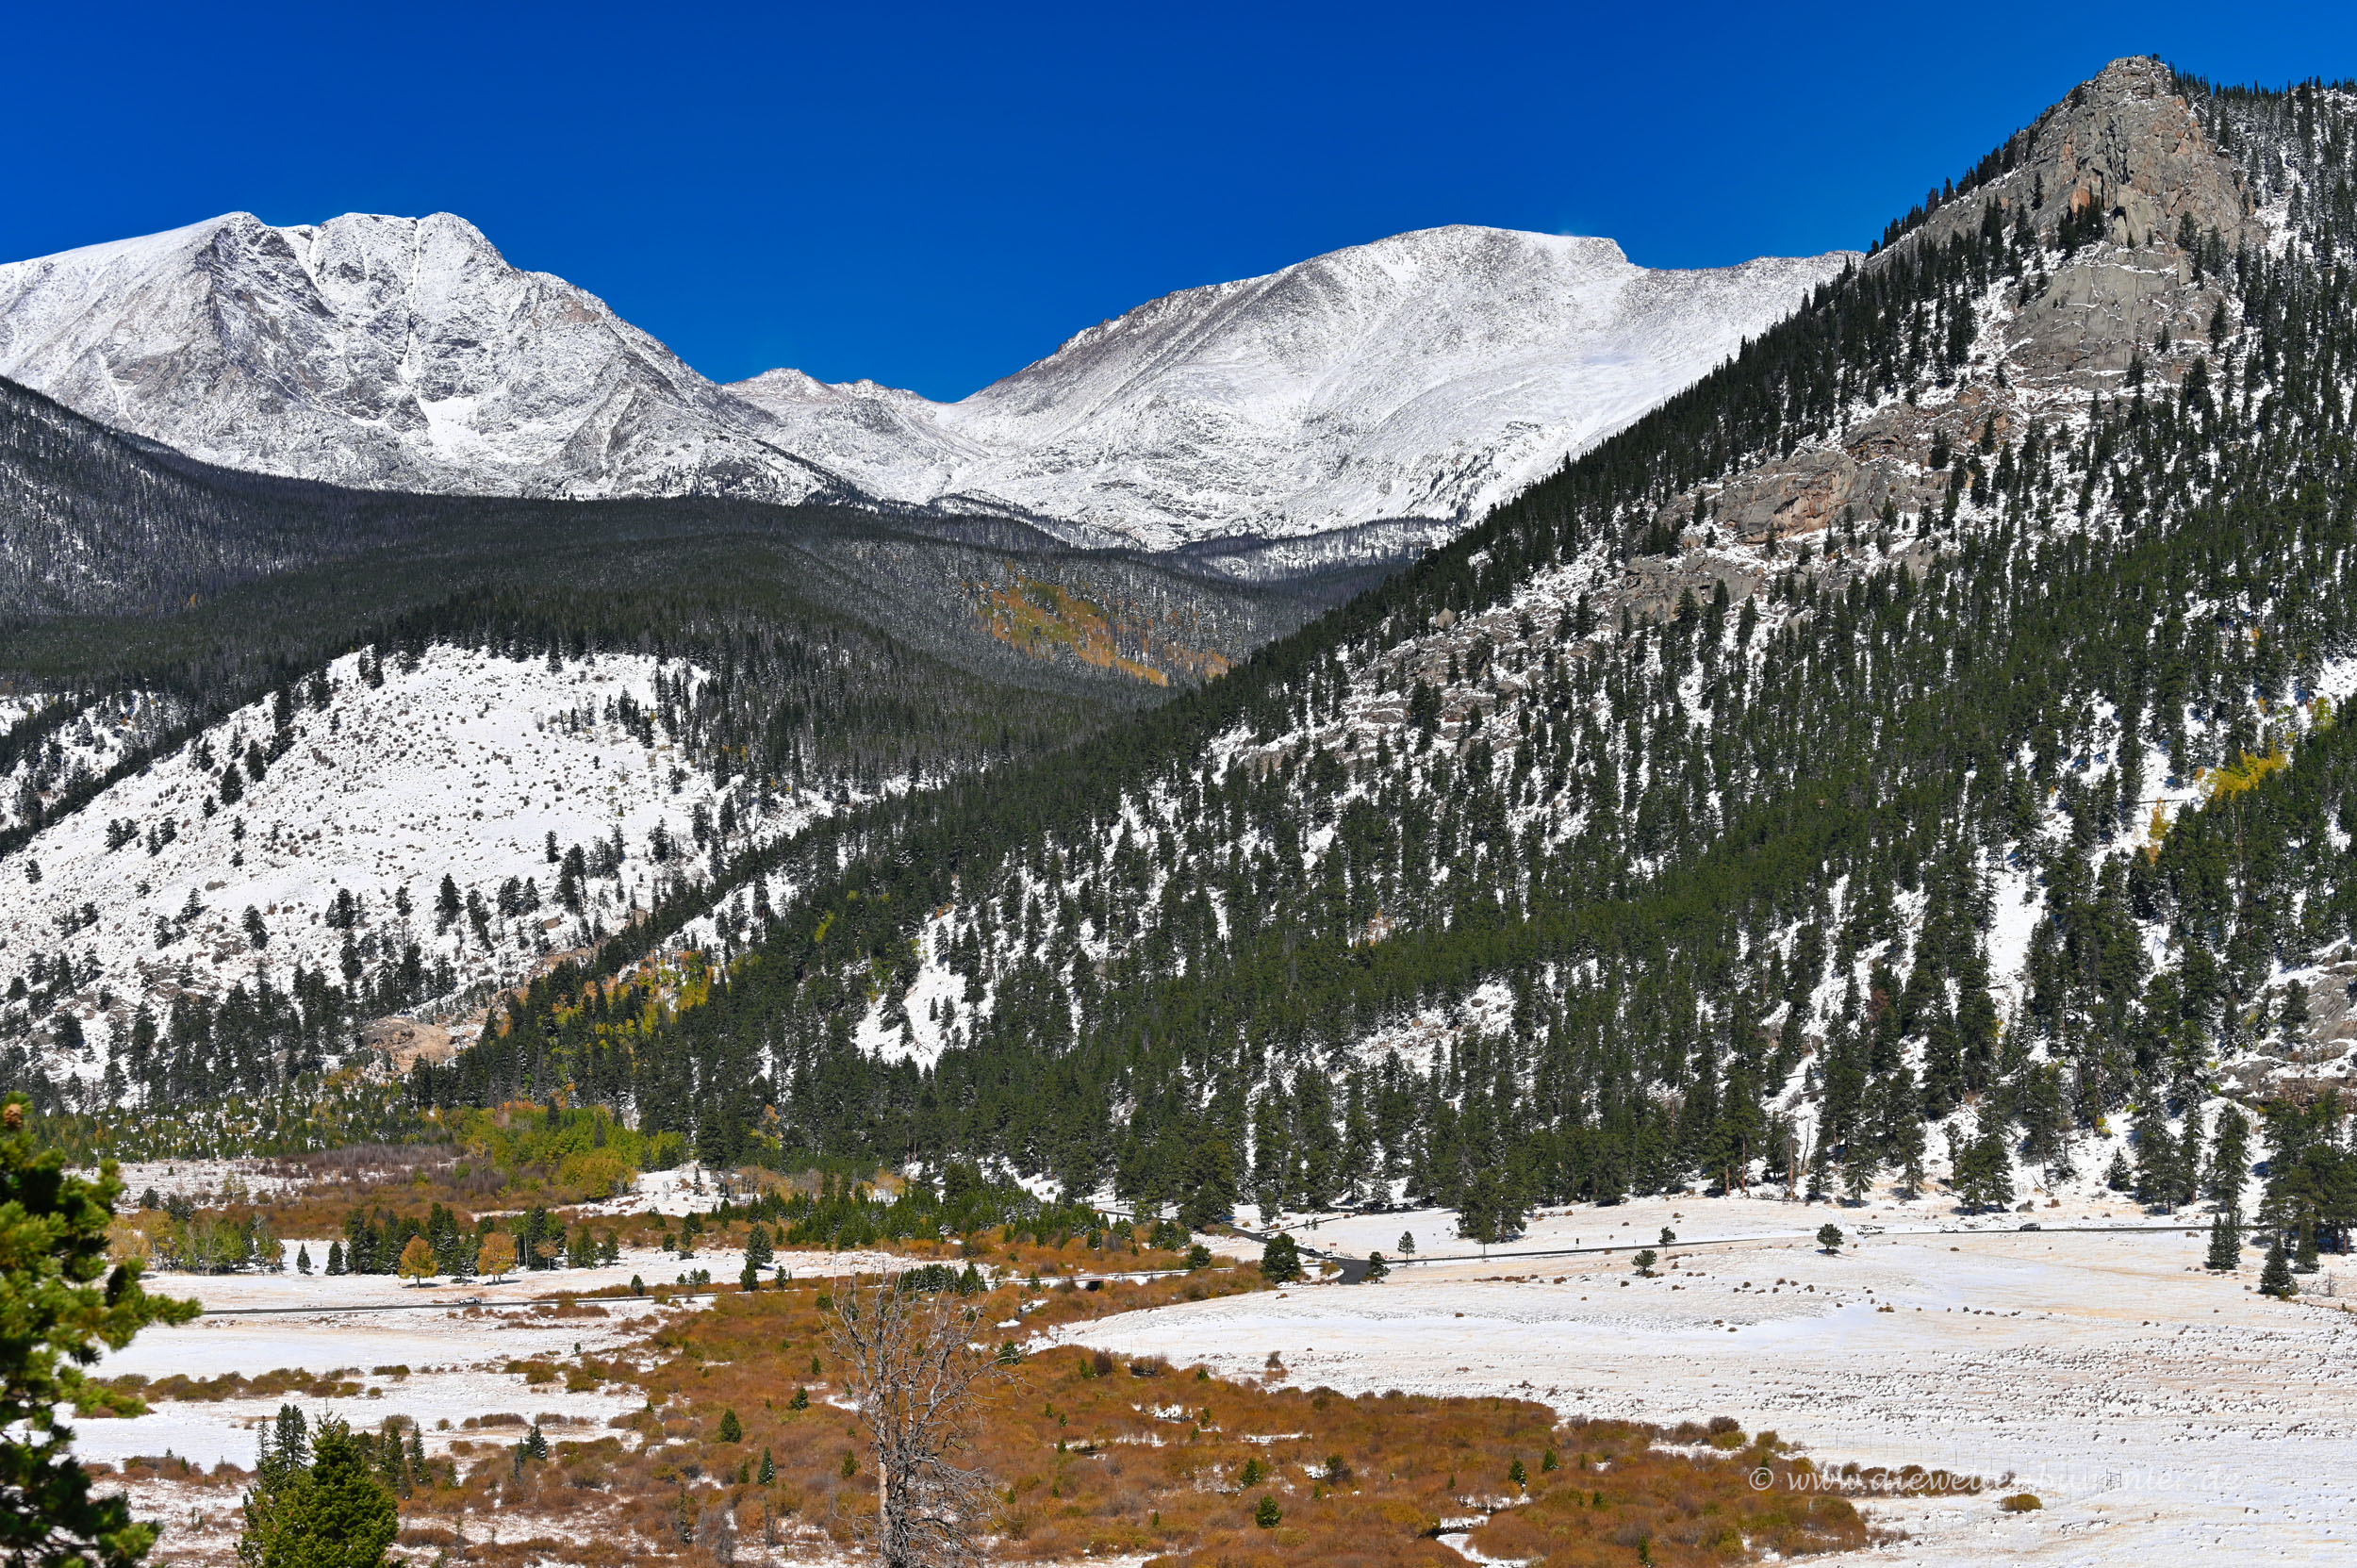 Landschaft der Rockies